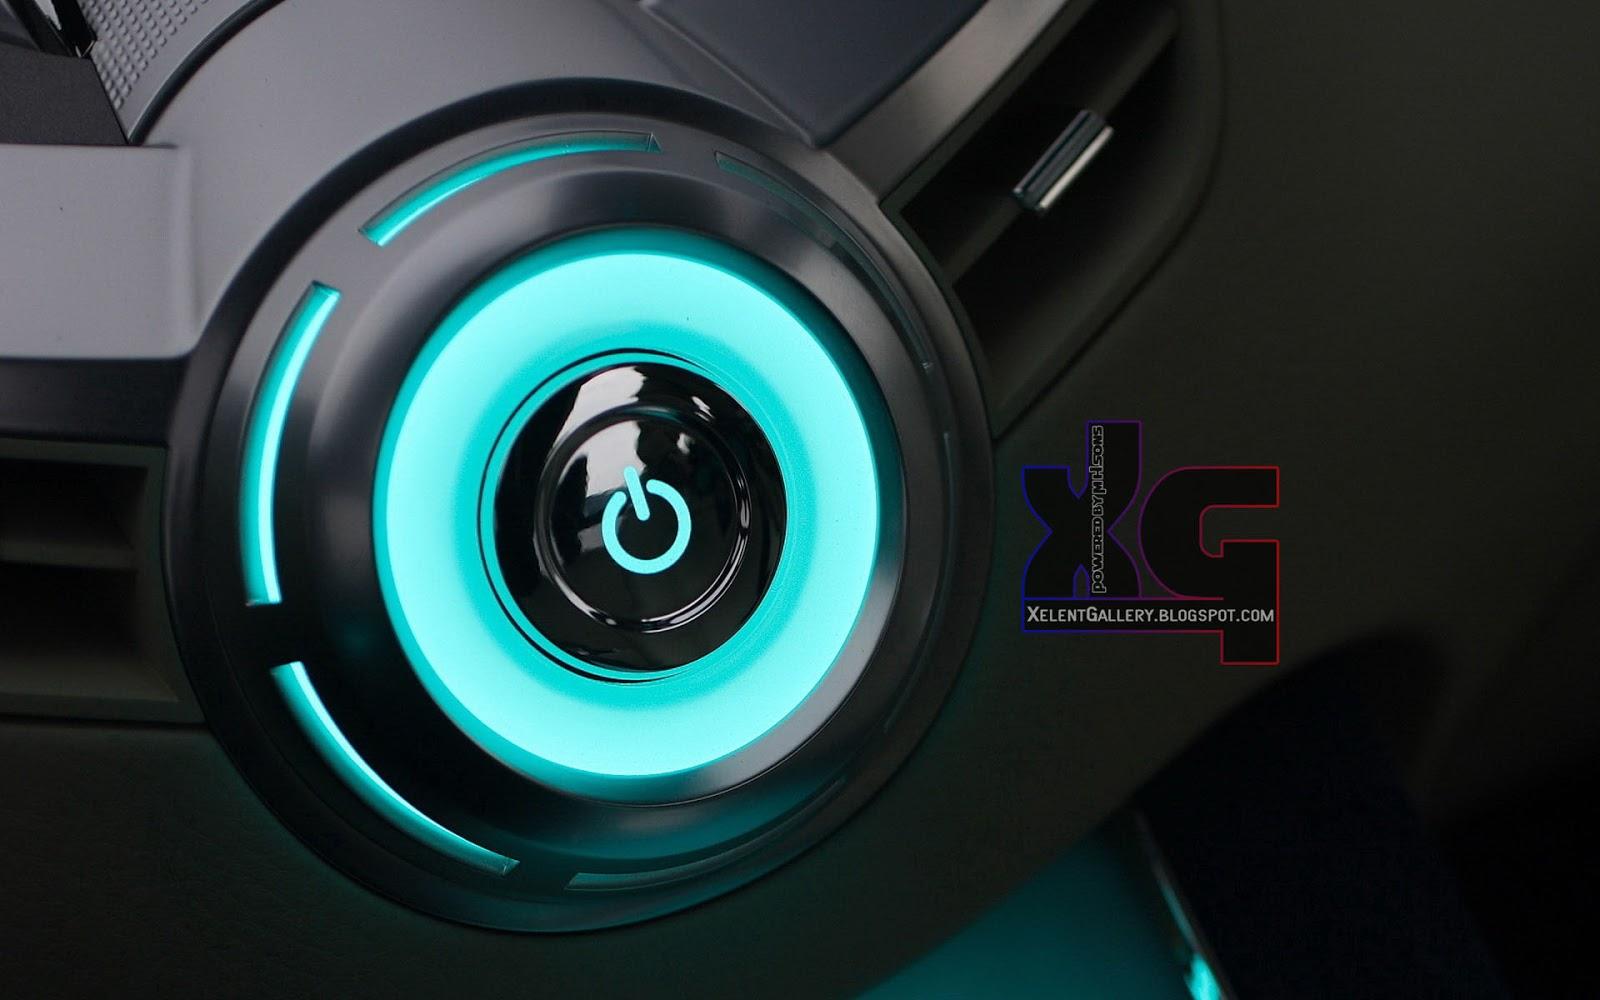 HD HI Tech Wallpapers Pack Xelent Gallery 1600x1000